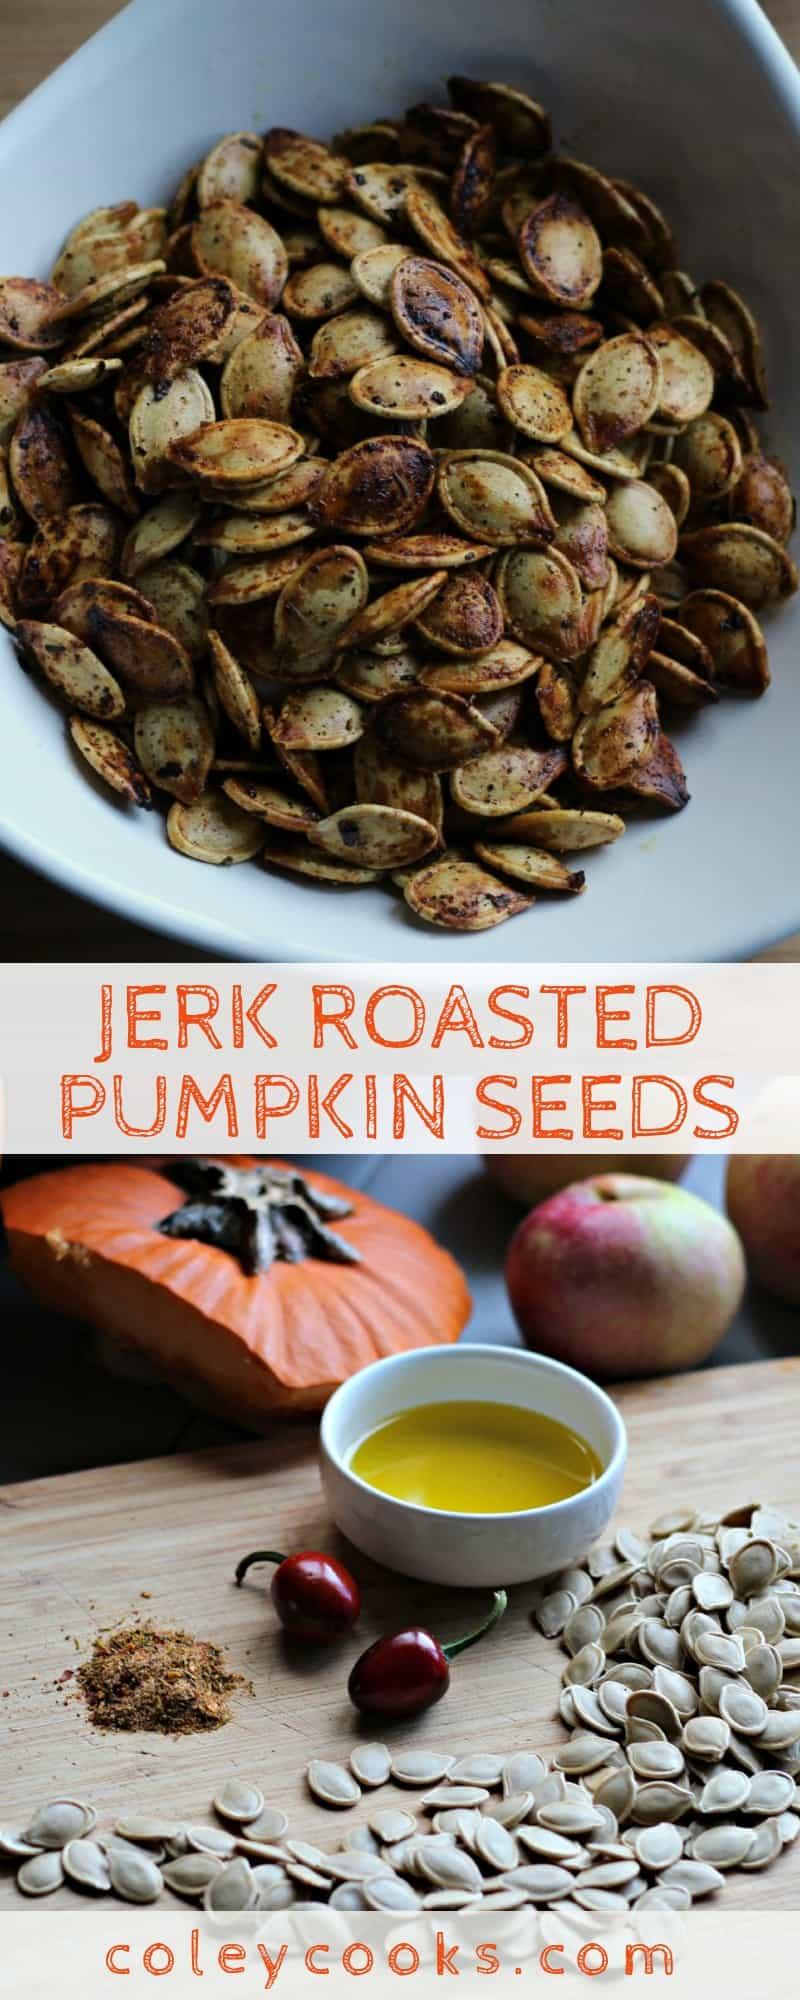 JERK ROASTED PUMPKIN SEEDS | This spicy recipe for Jamaican jerk roasted pumpkin seeds is perfect for Halloween! #pumpkin #pumpkinseeds #halloween #pumpkincarving #recipe #method #technique #jerk #Jamaican | ColeyCooks.com